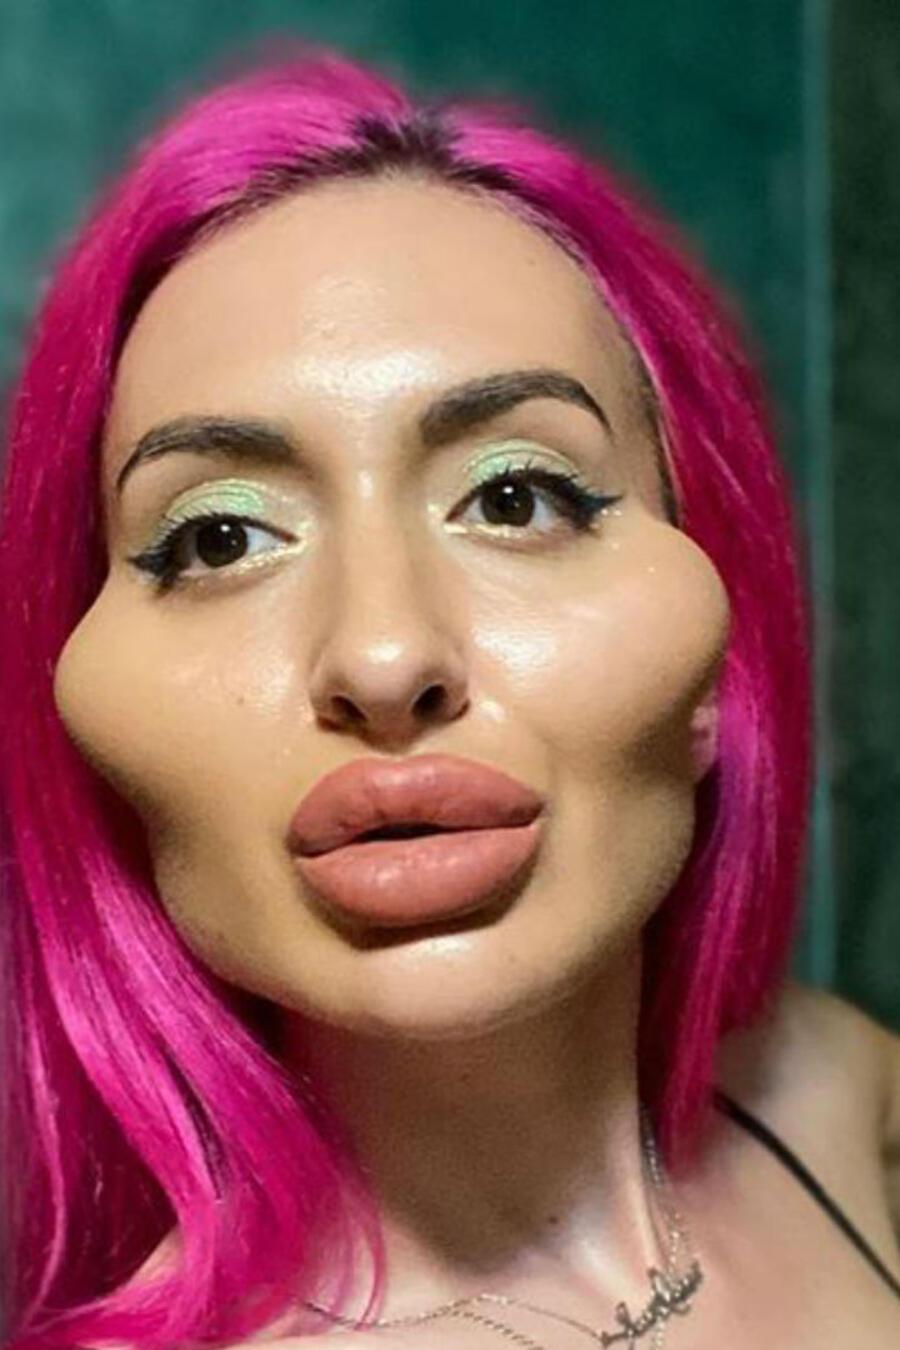 Mujer con mejillas voluptuosas